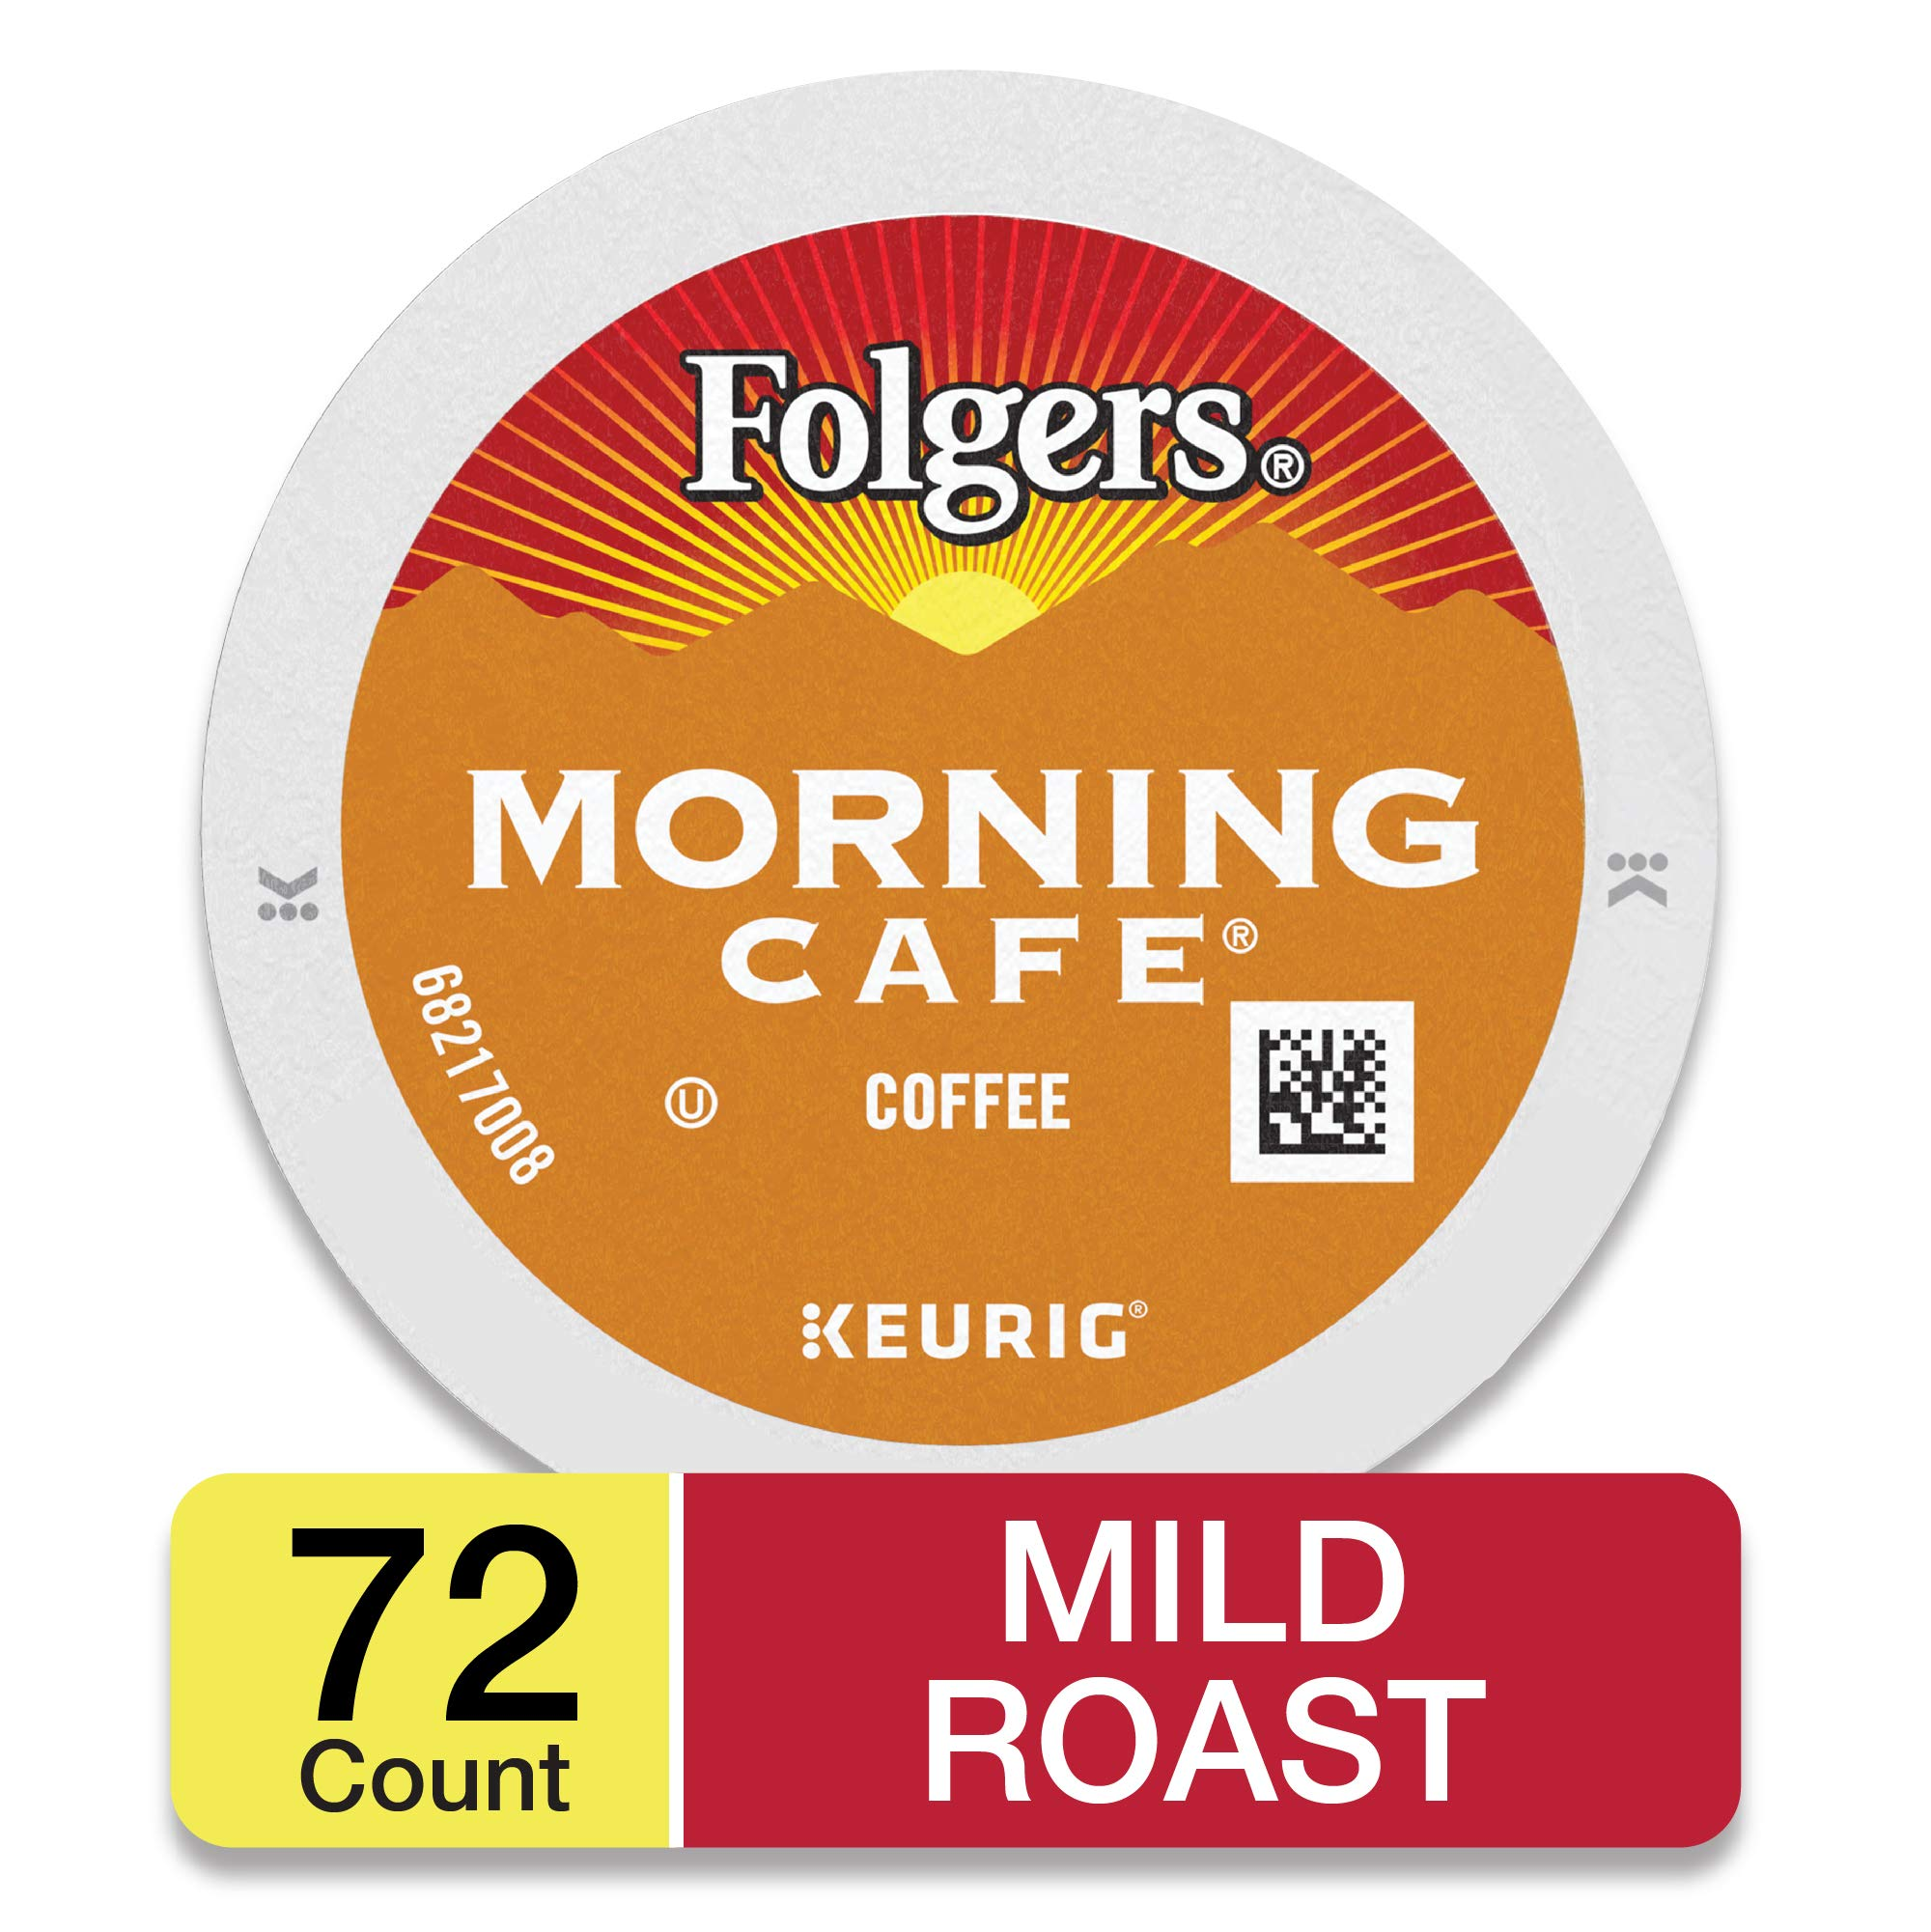 Folgers モーニングカフェ マイルドローストコーヒー 3packages 72 Pods 通販 Lineポイント最大0 5 Get Lineショッピング